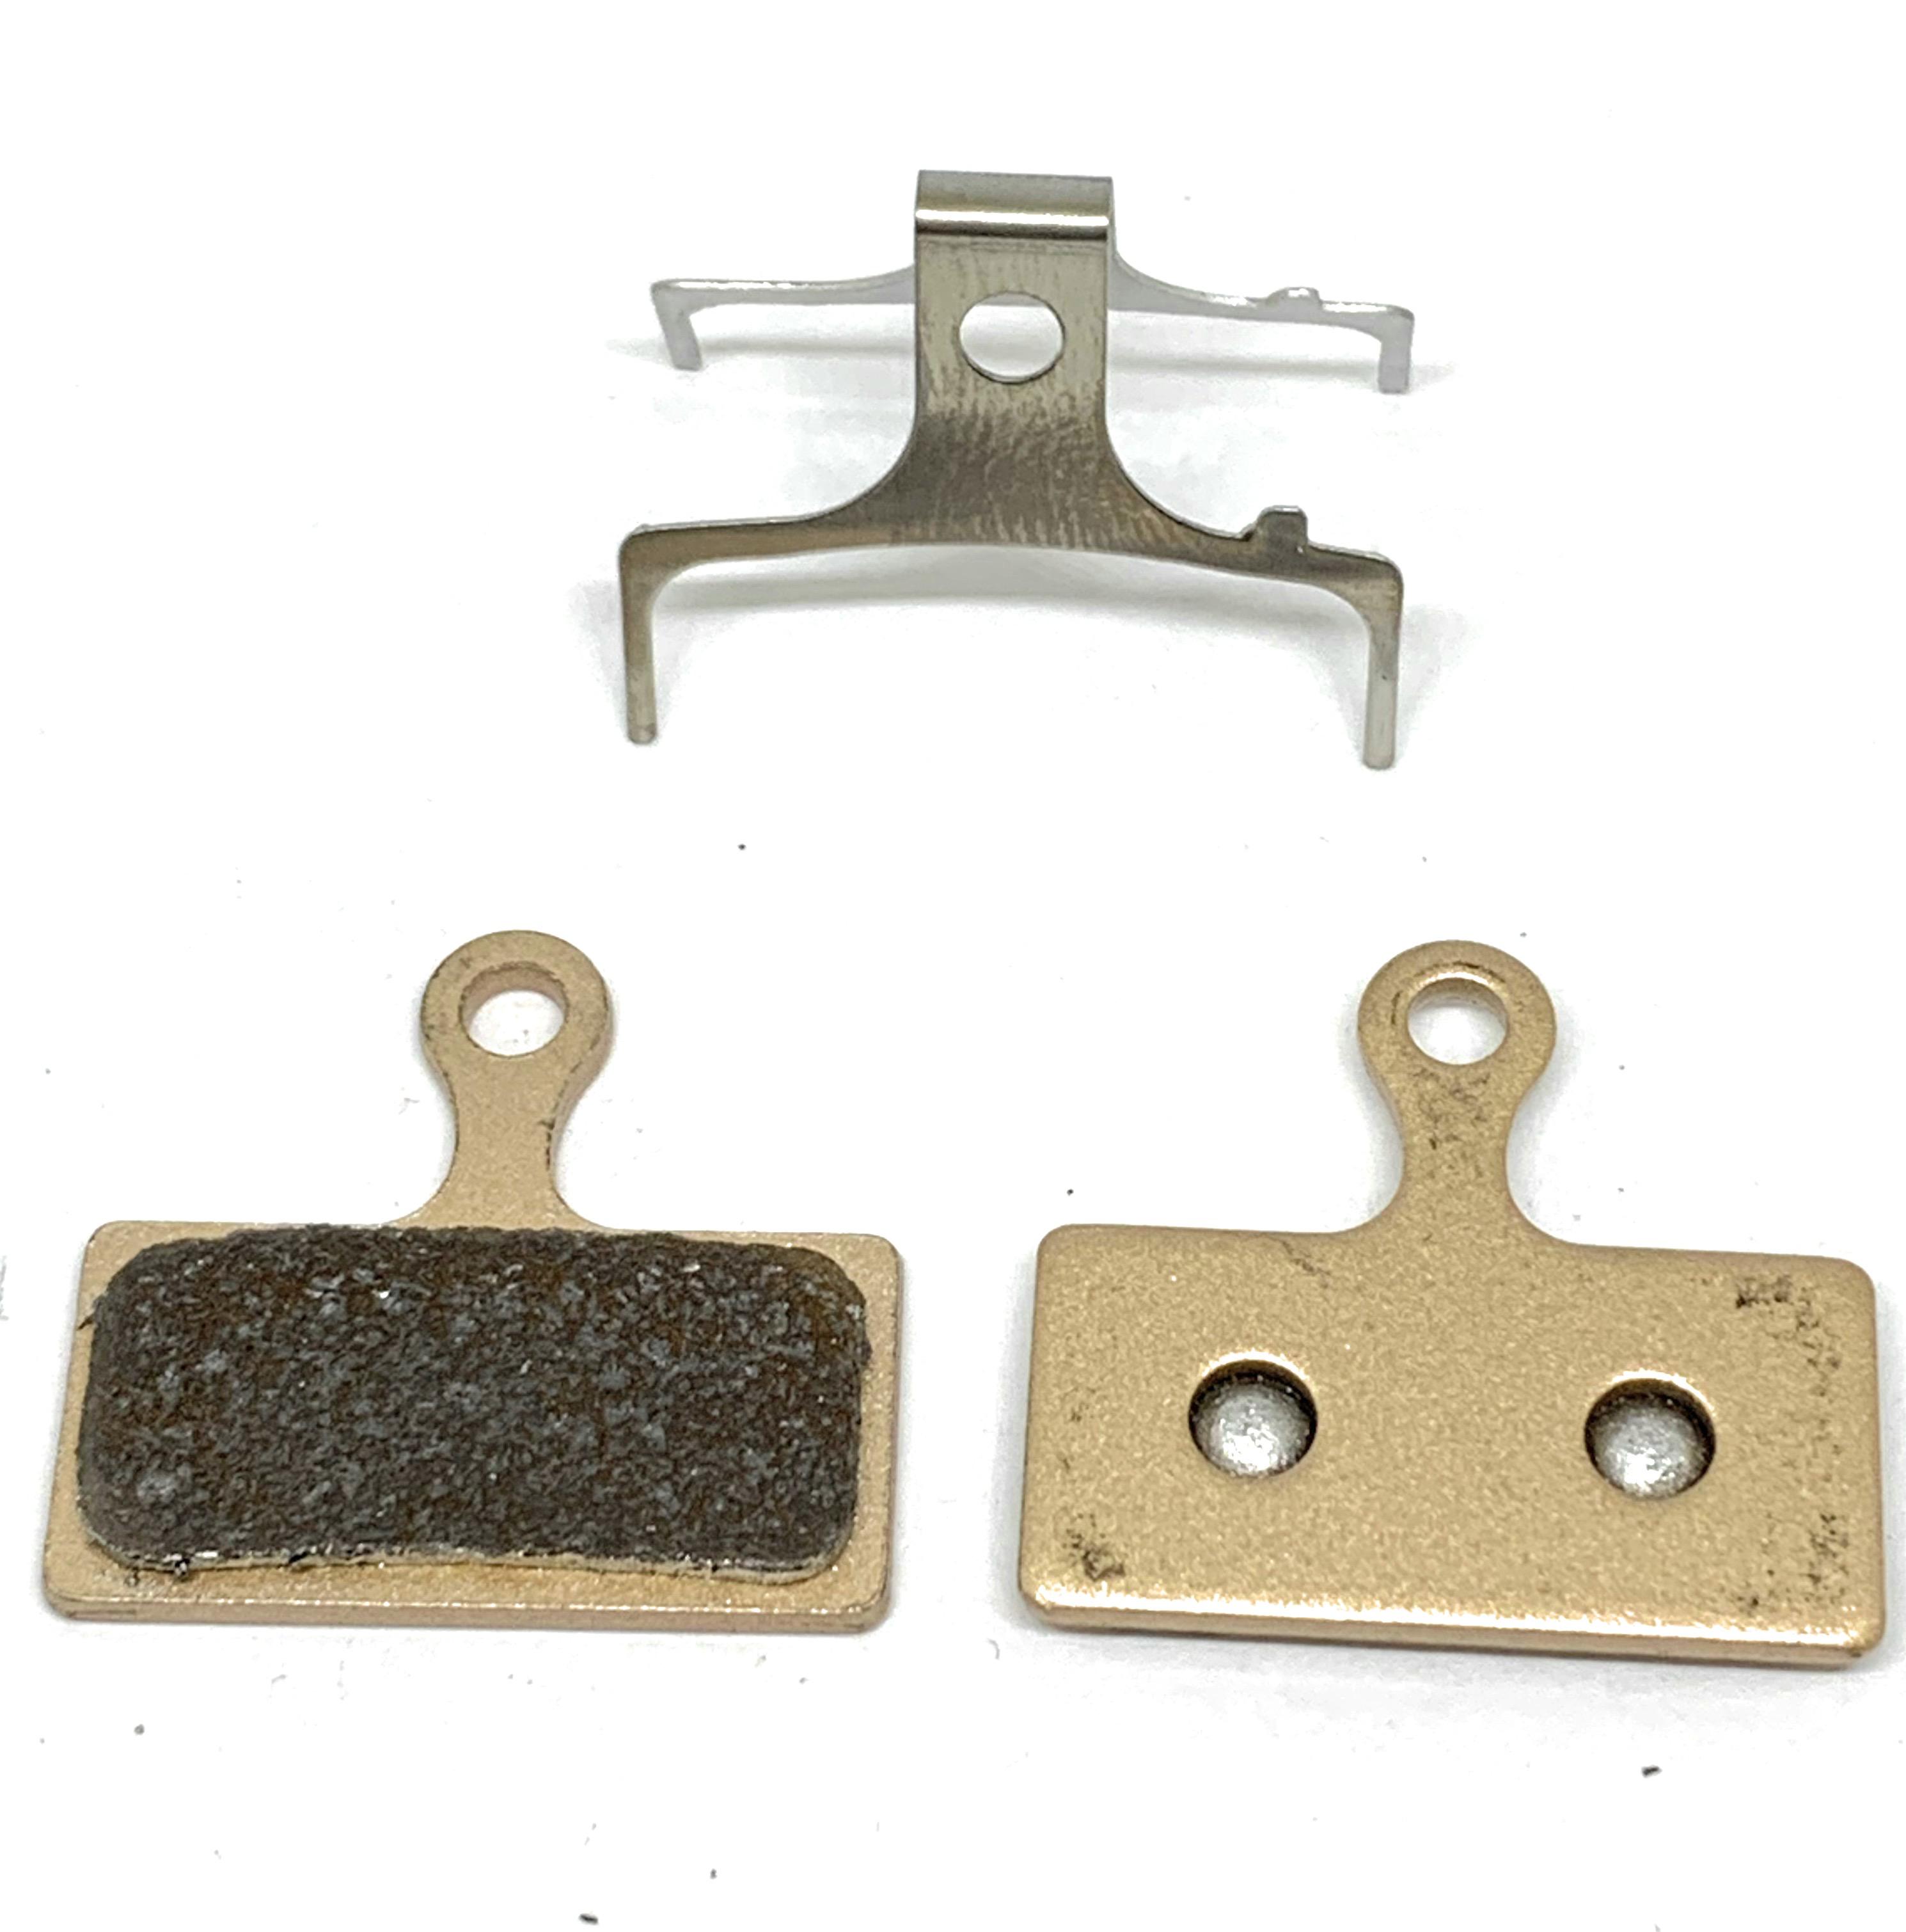 ORGANIC DISC BRAKE PADS FITS SHIMANO 2011 XTR M985 M988 XT M785 SLX M666